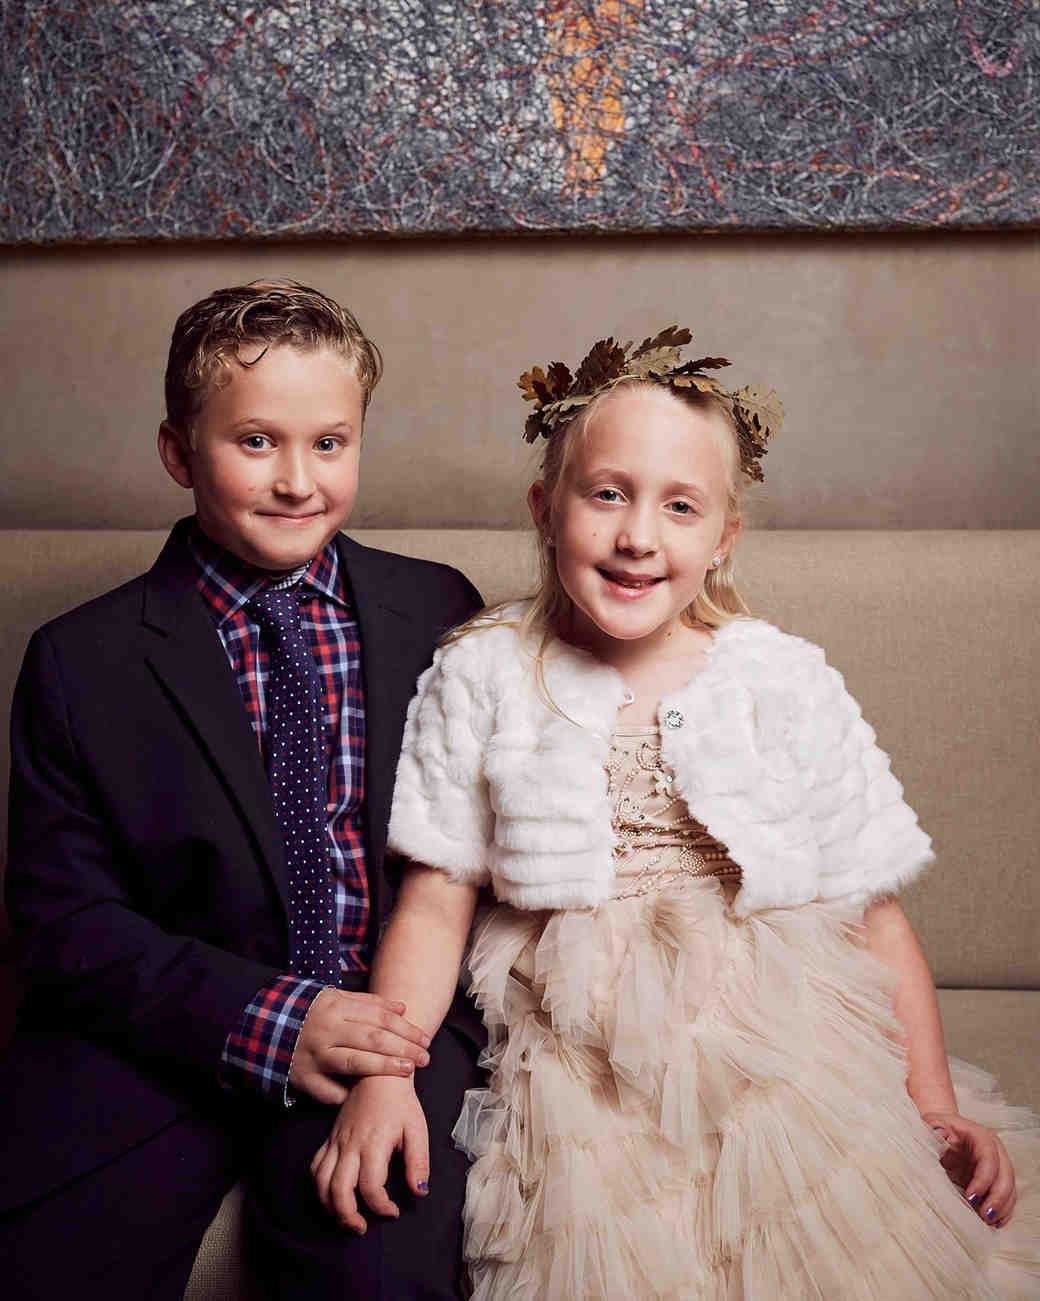 daisy eugene wedding children portrait